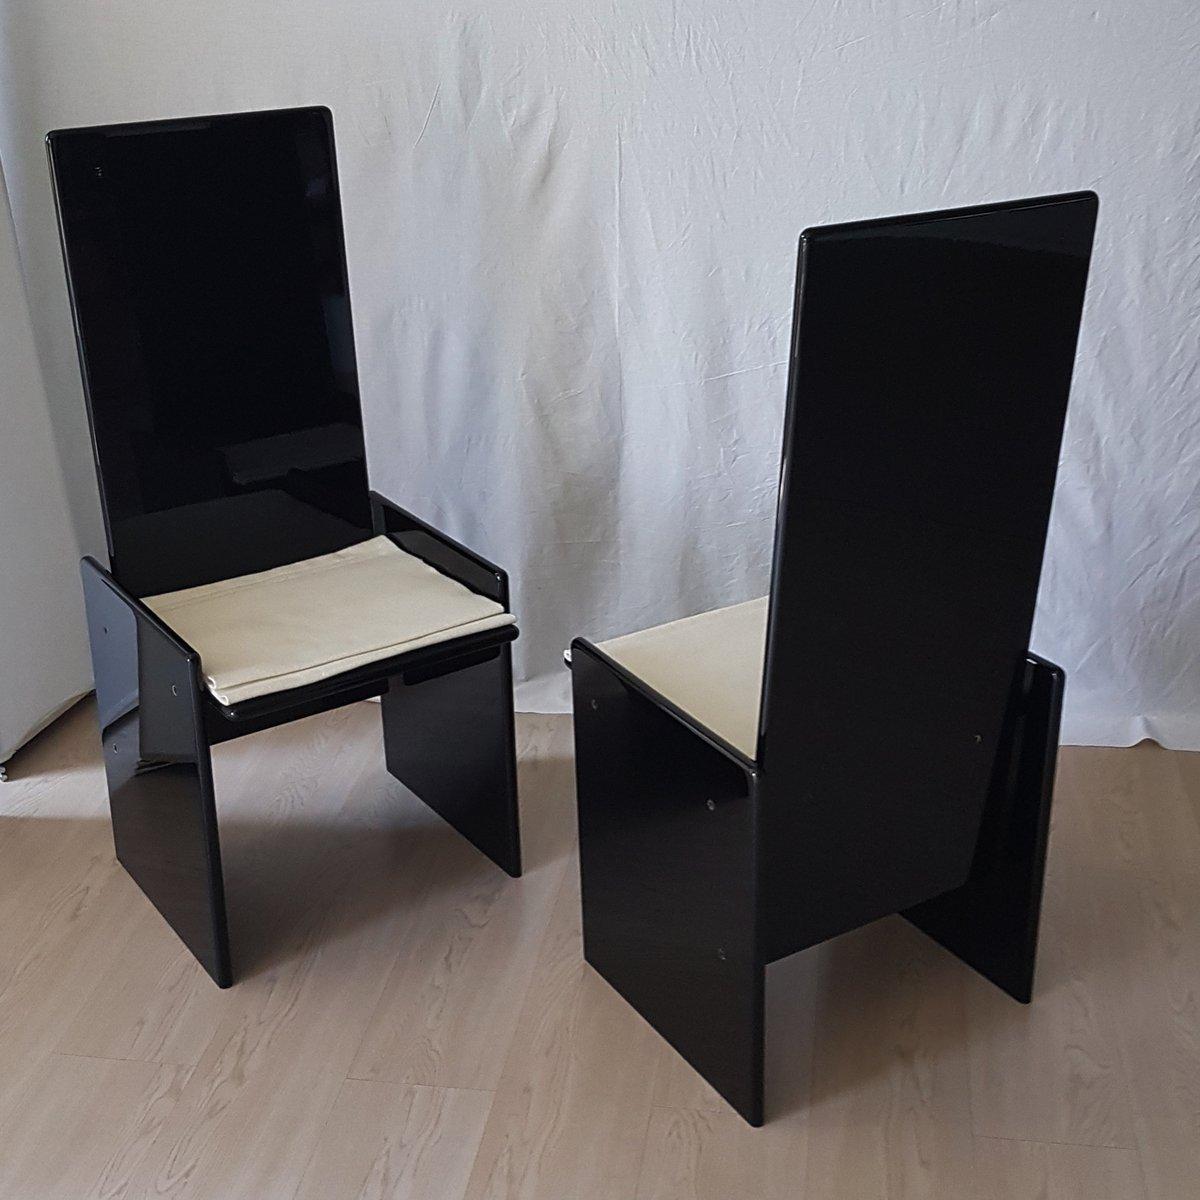 schwarze vintage st hle von kazuhide takahama f r simon. Black Bedroom Furniture Sets. Home Design Ideas